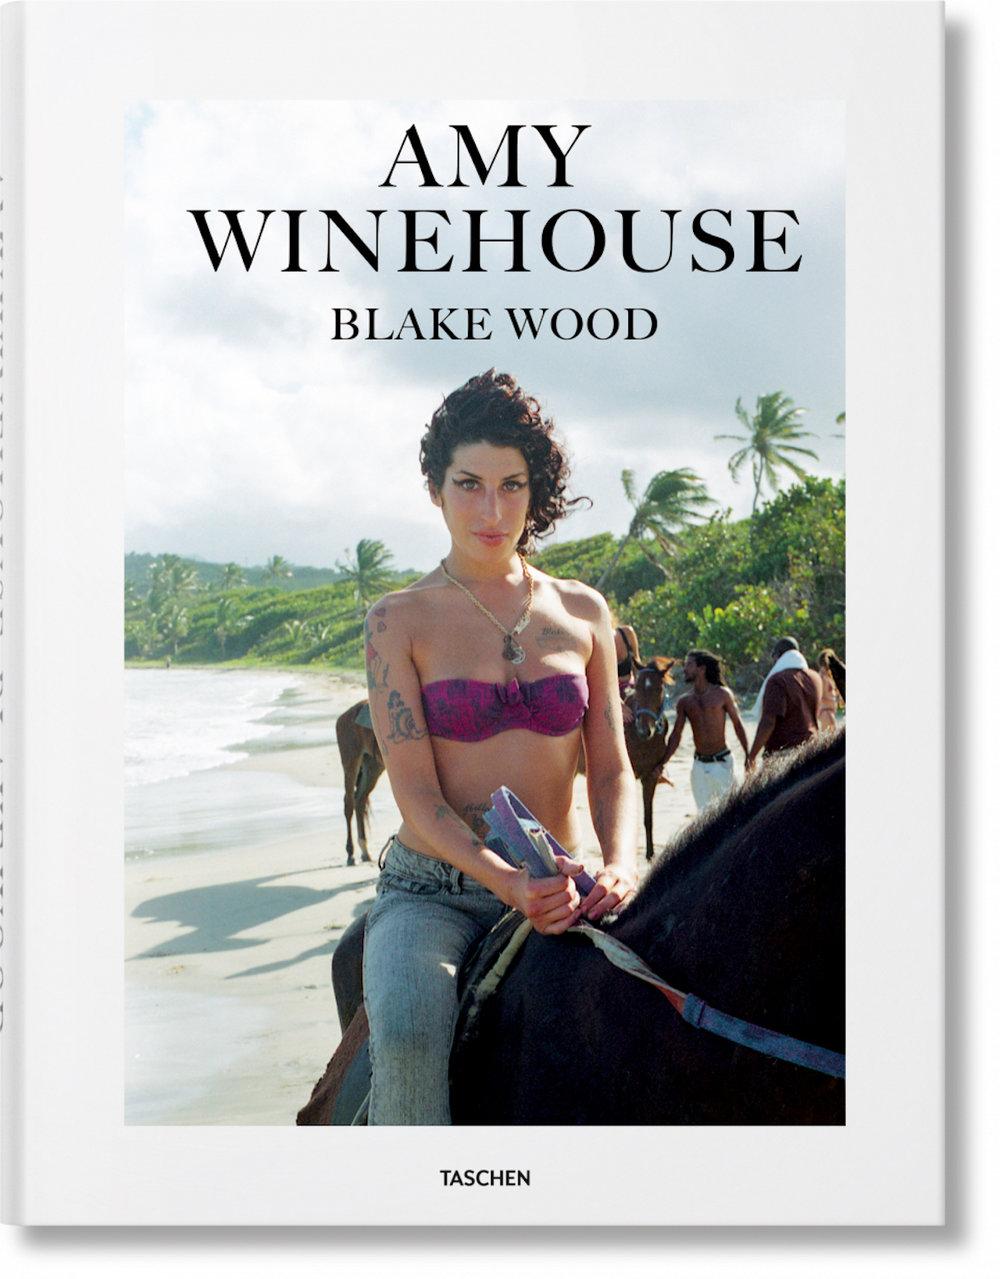 TASCHEN - invites you to meet photographer Blake Wood at a signing of his new bookAmy Winehouse.Blake WoodSunday November 182-4 pmTASCHEN107 Greene StreetNew York, NY 10012